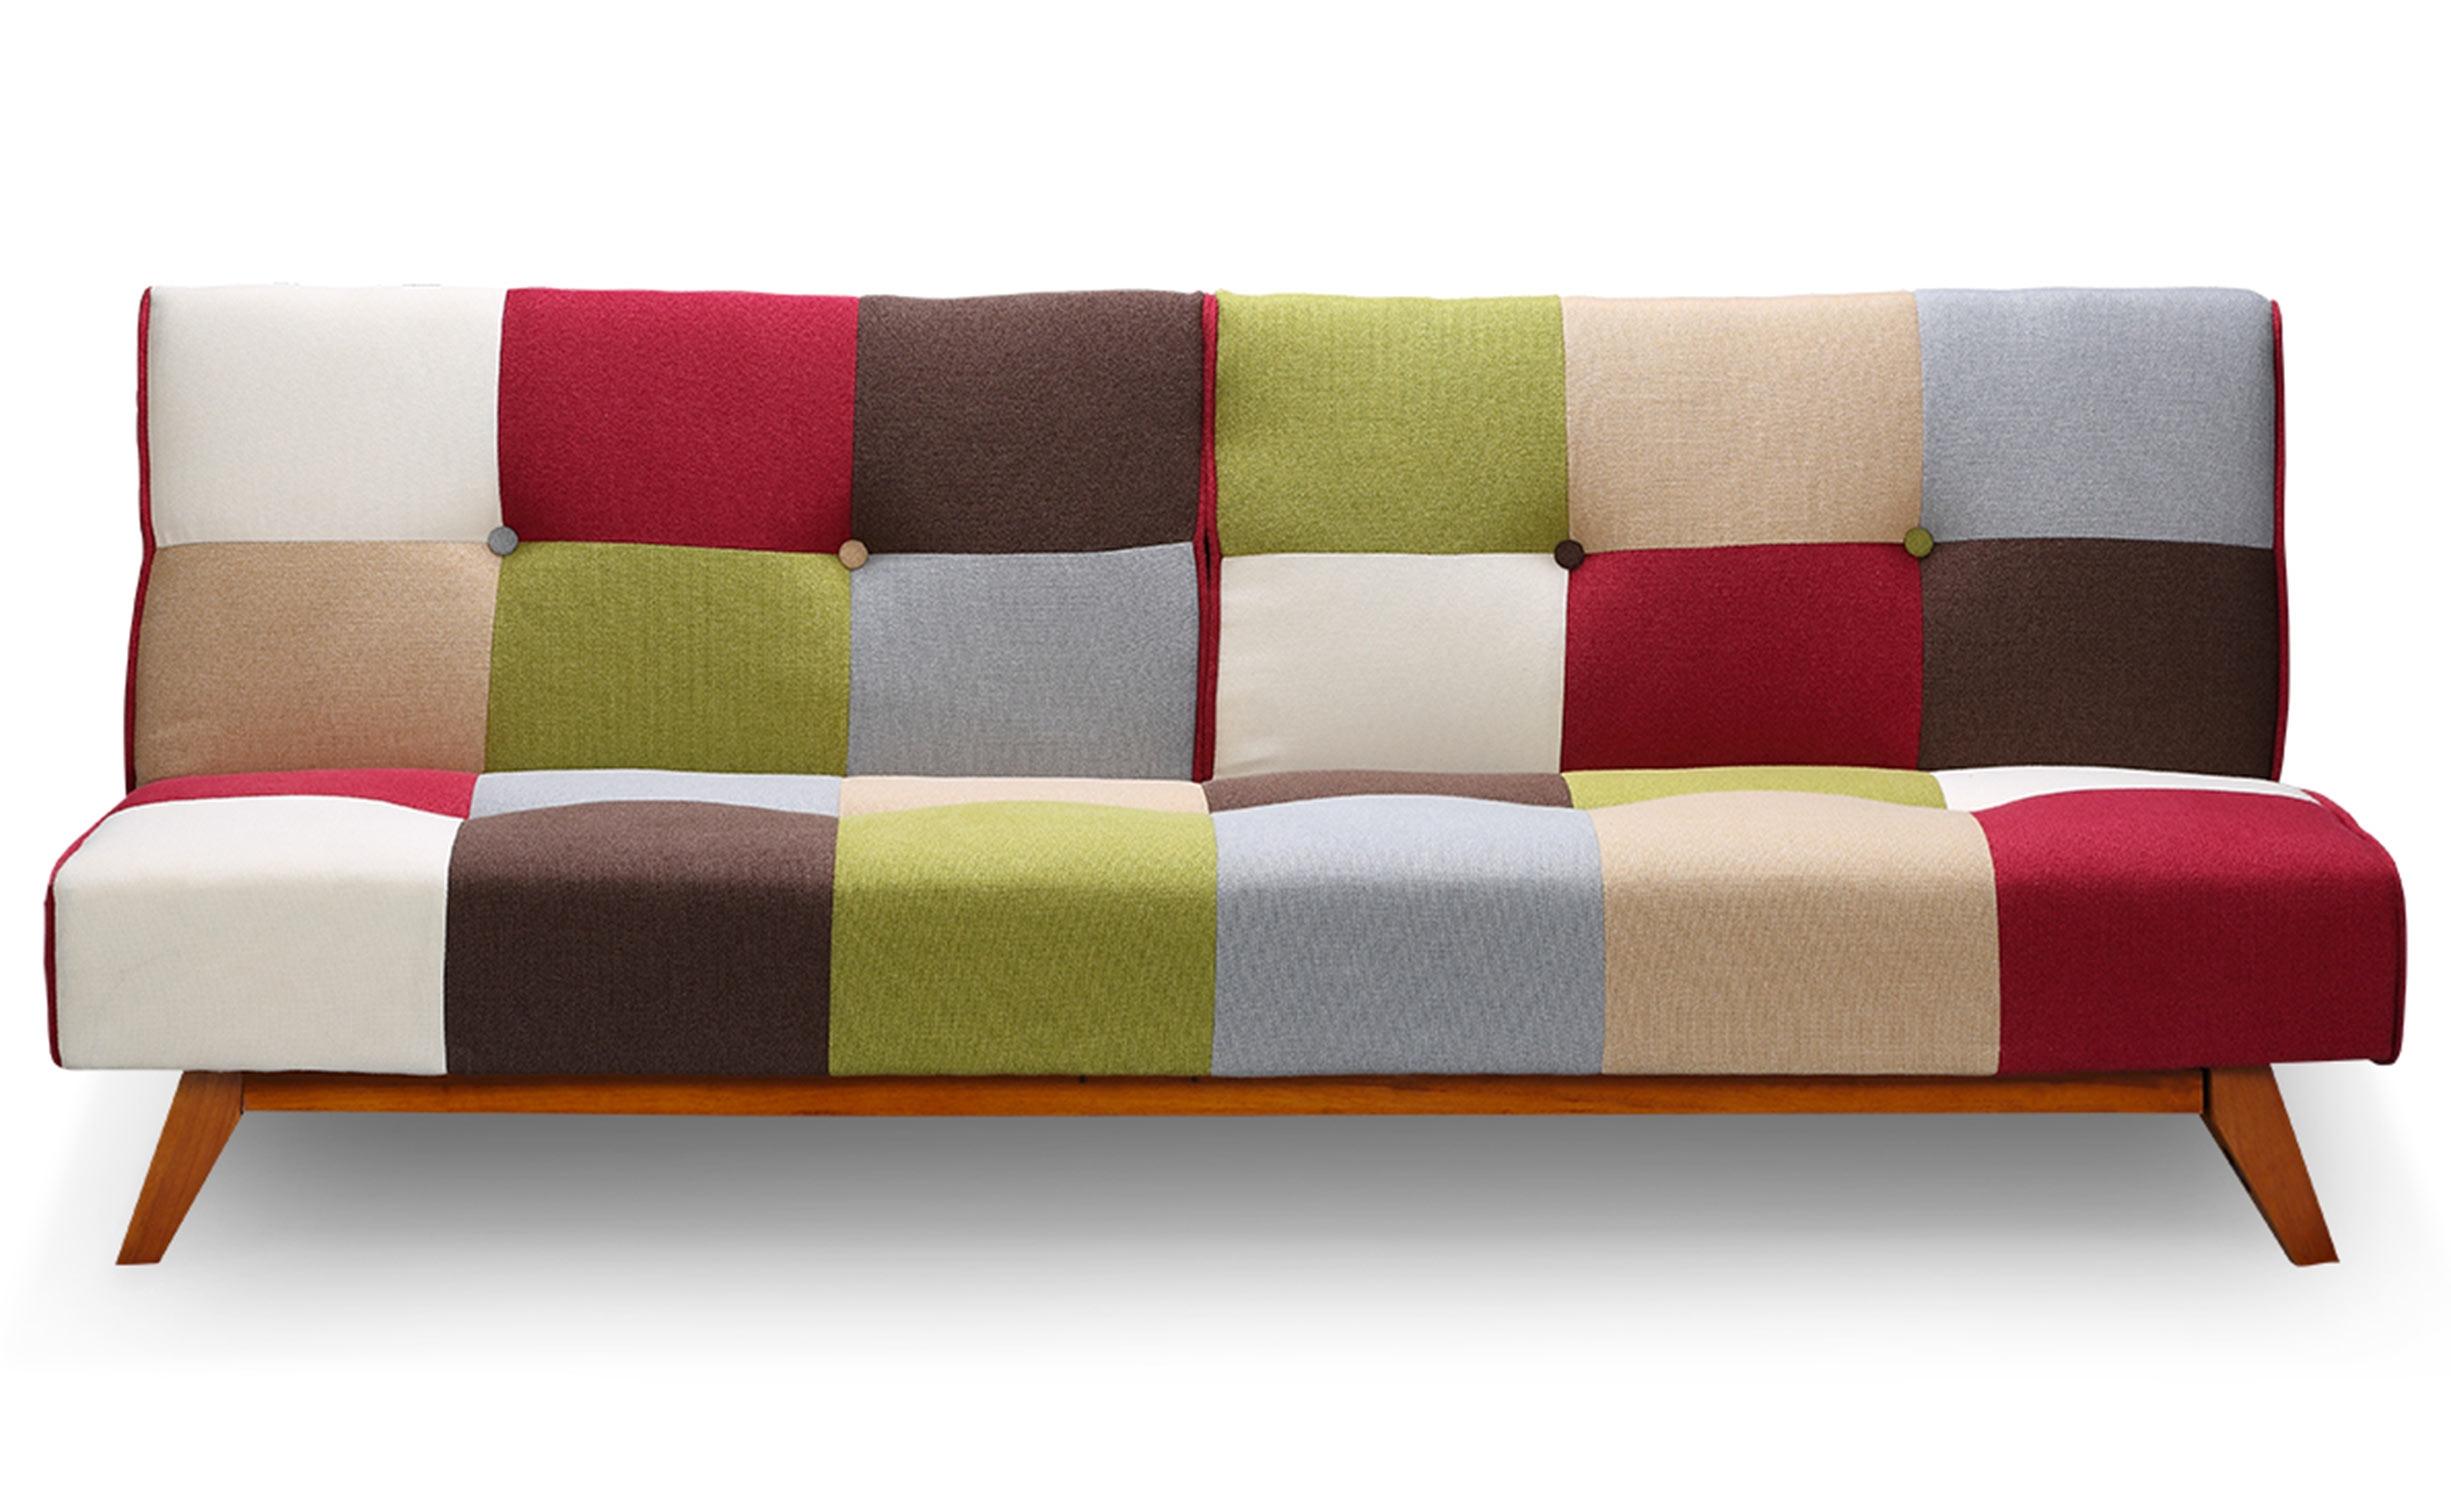 Canapé convertible clic-clac scandinave Yazu Multicolore